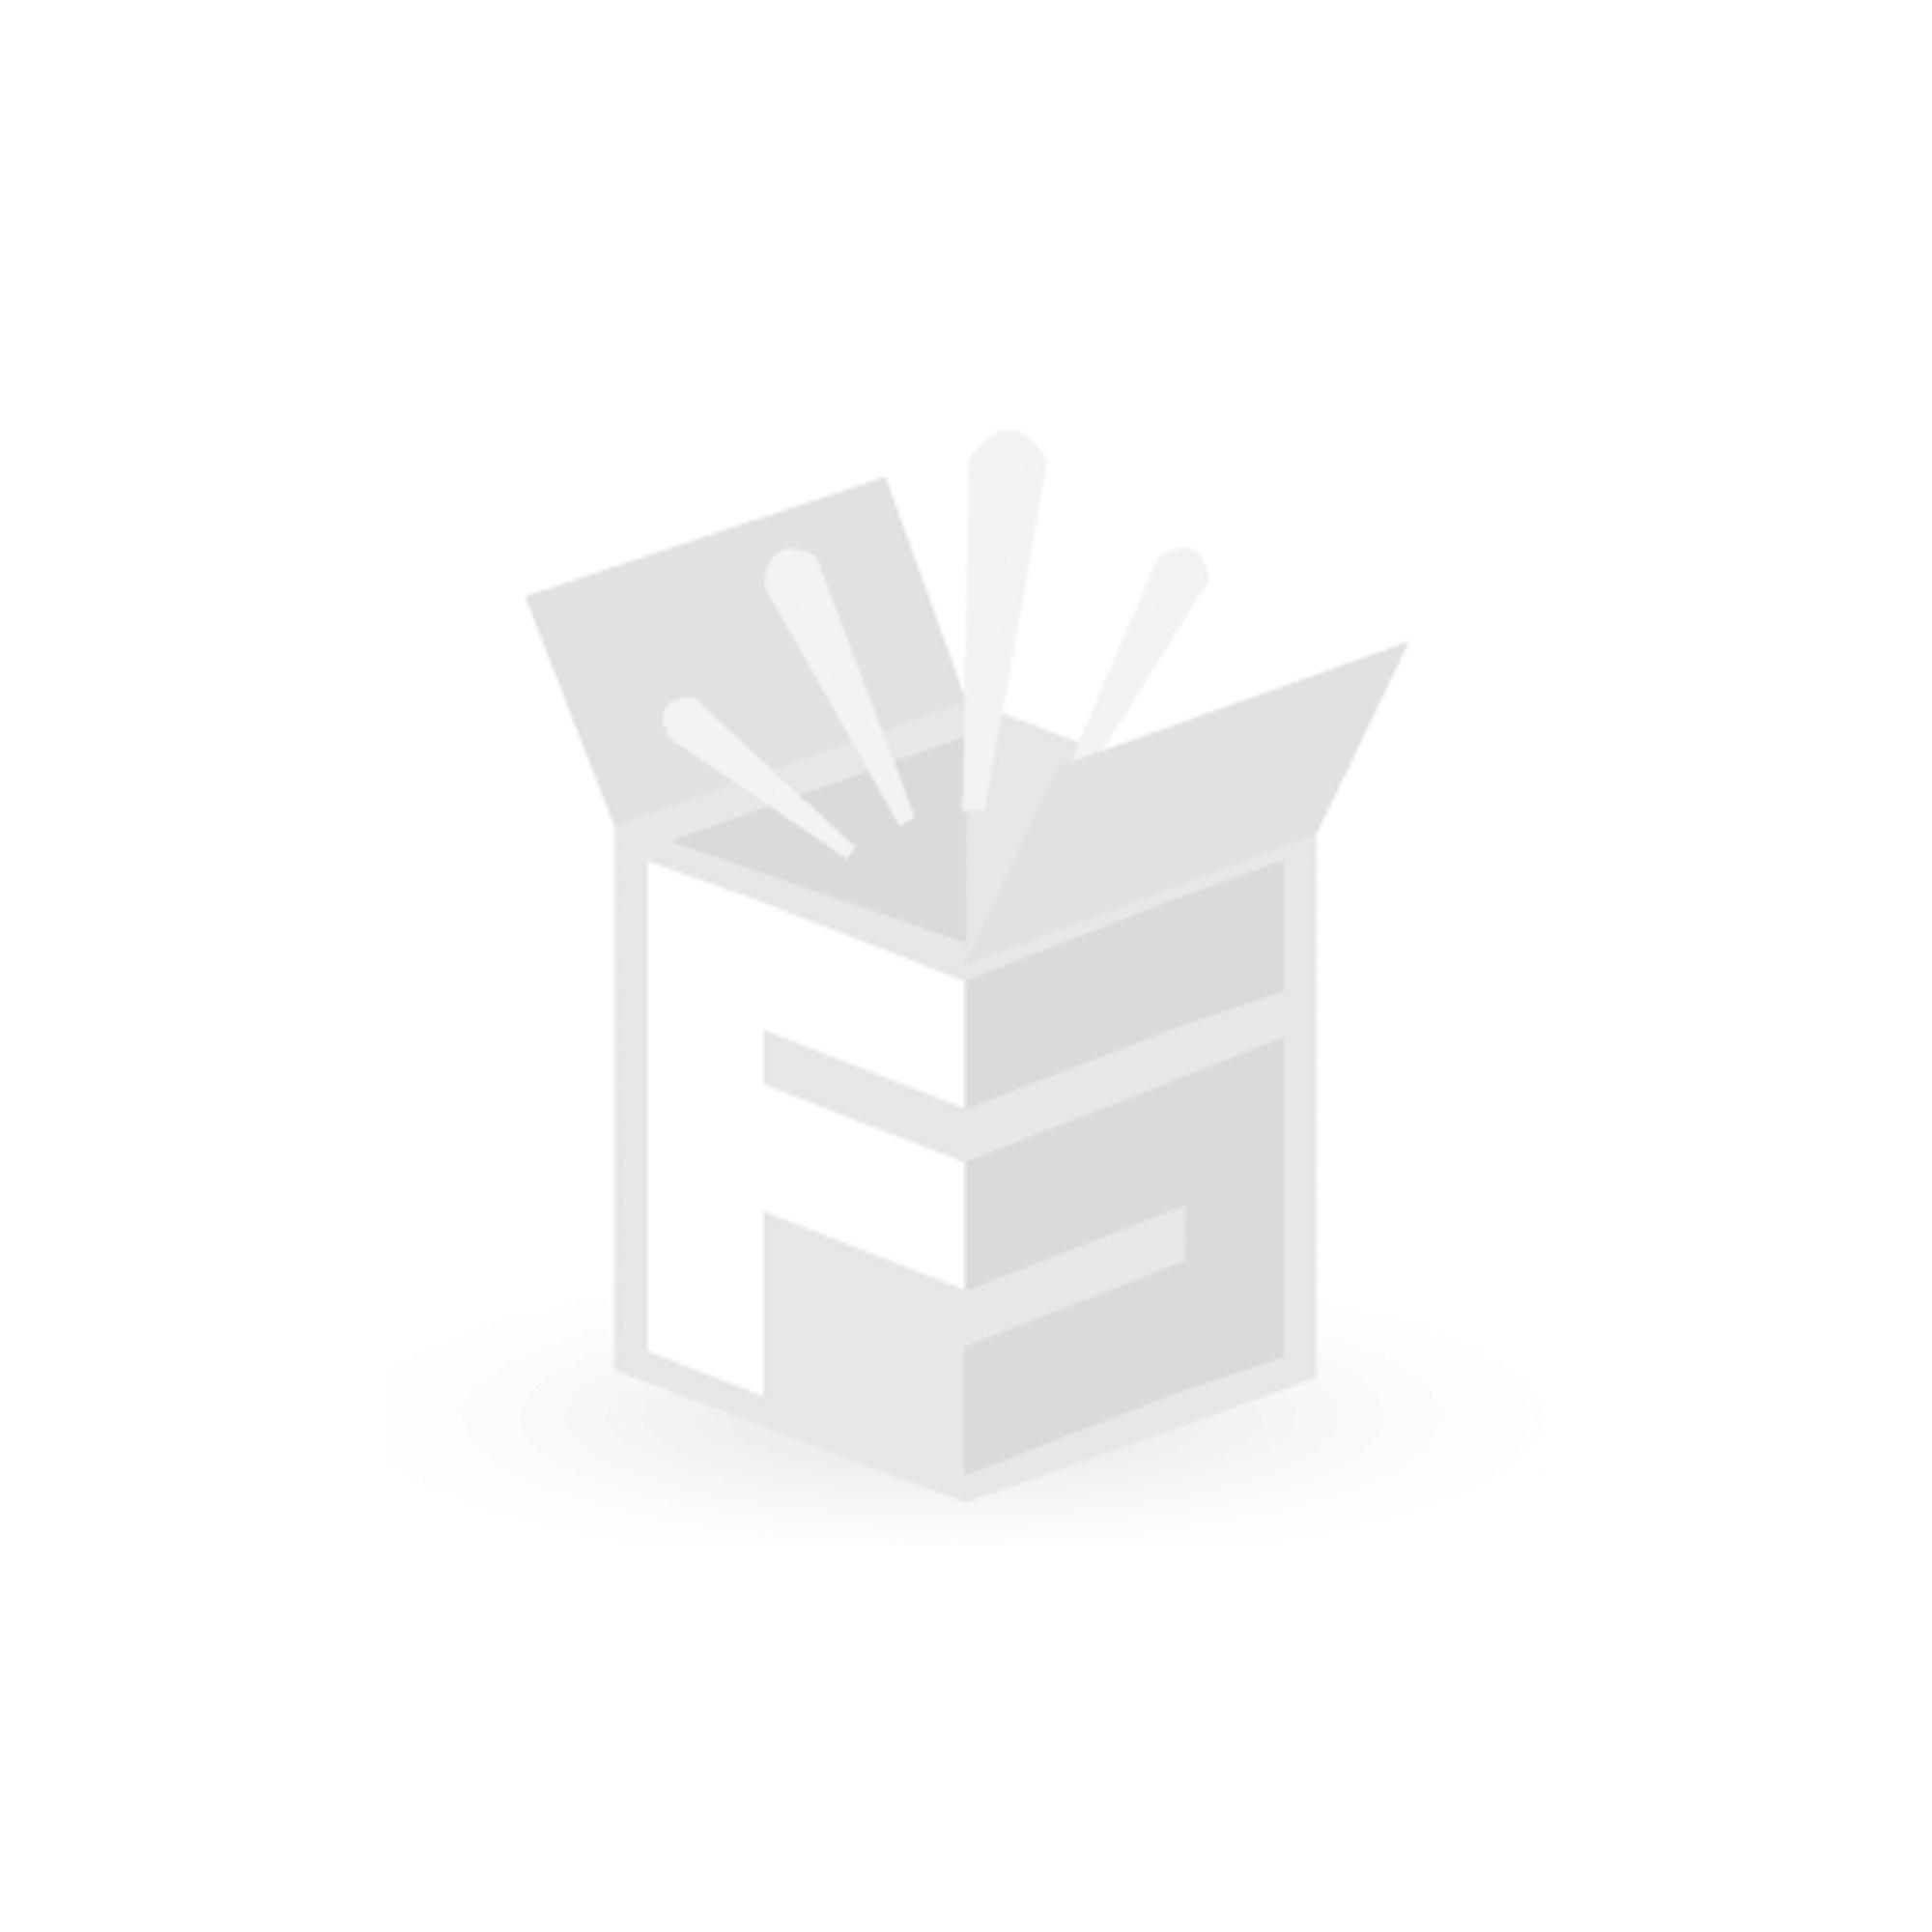 Fiskars Messer-Set 7-teilig, mit Holzblock